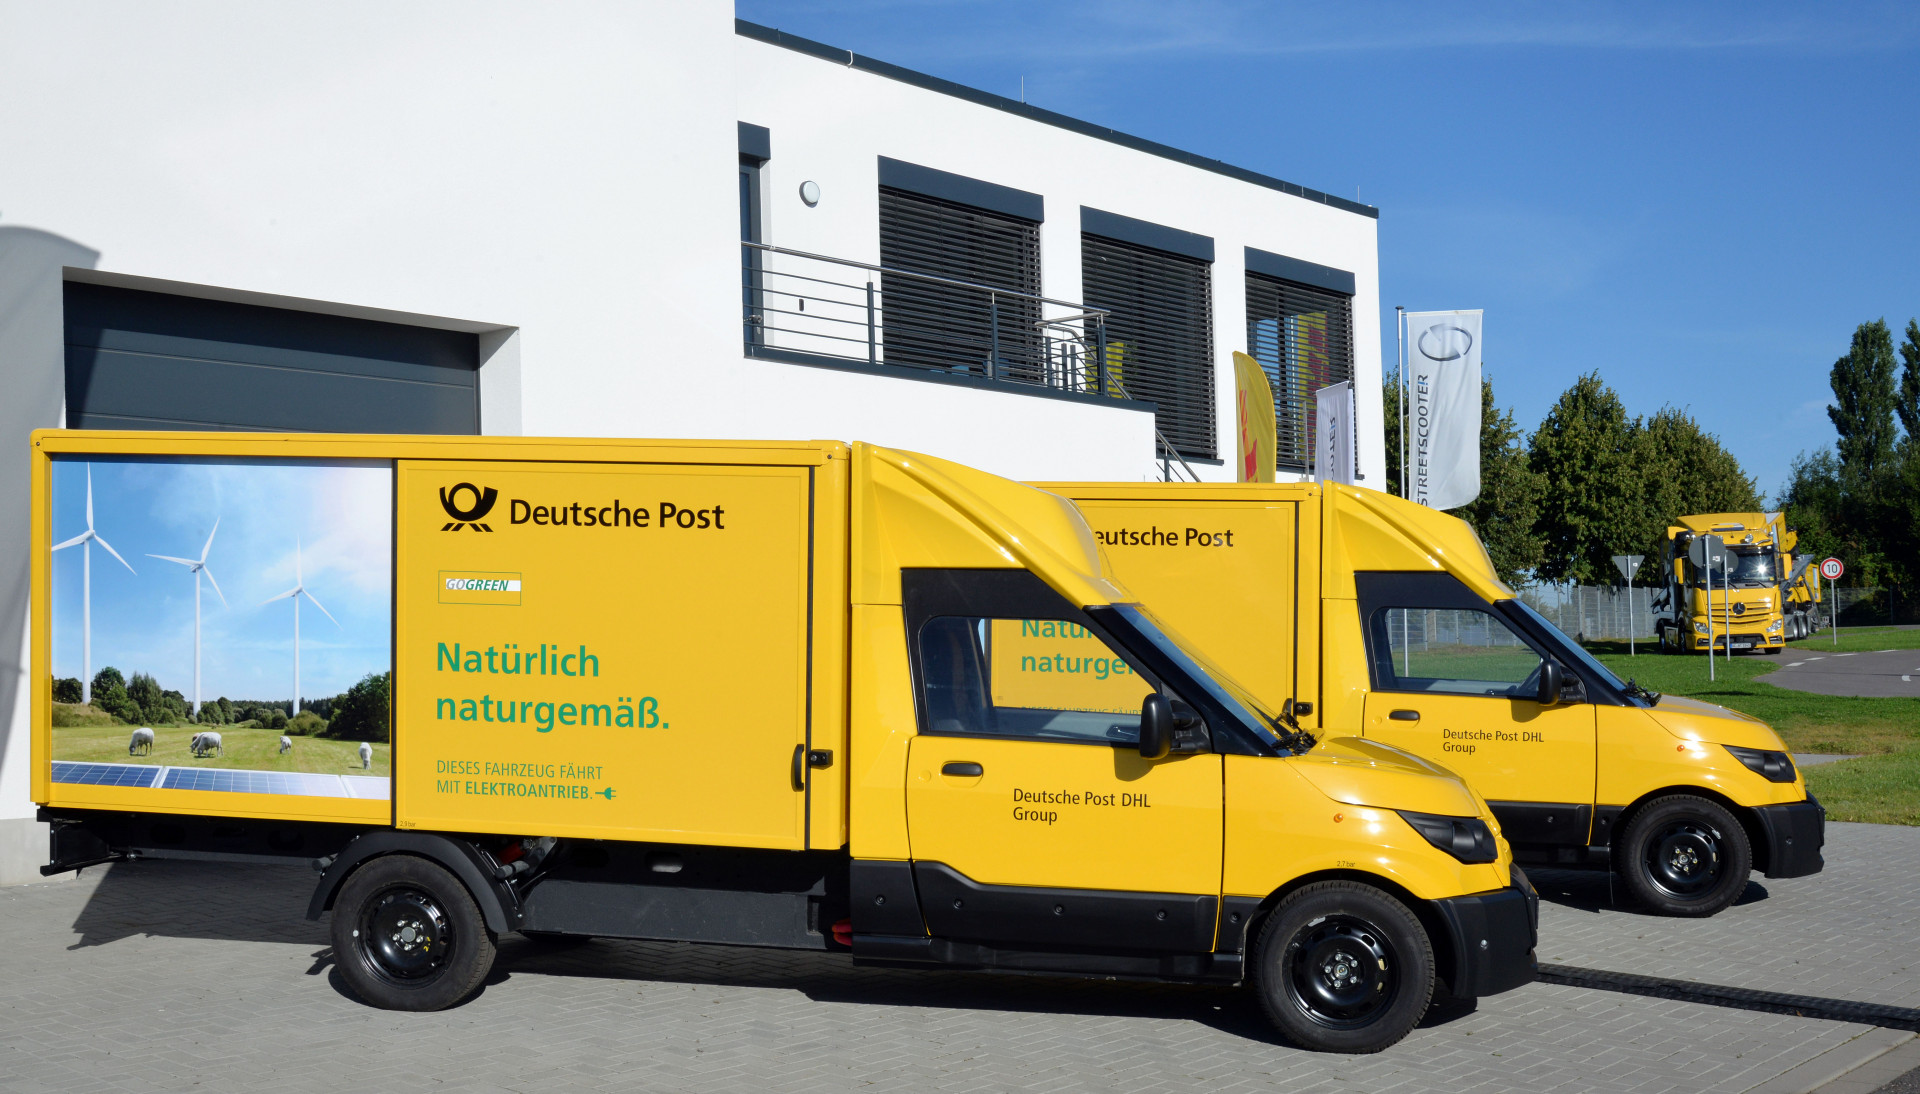 Autonomer Streetscooter Deutsche Post Dhl Will Selbstfahrende